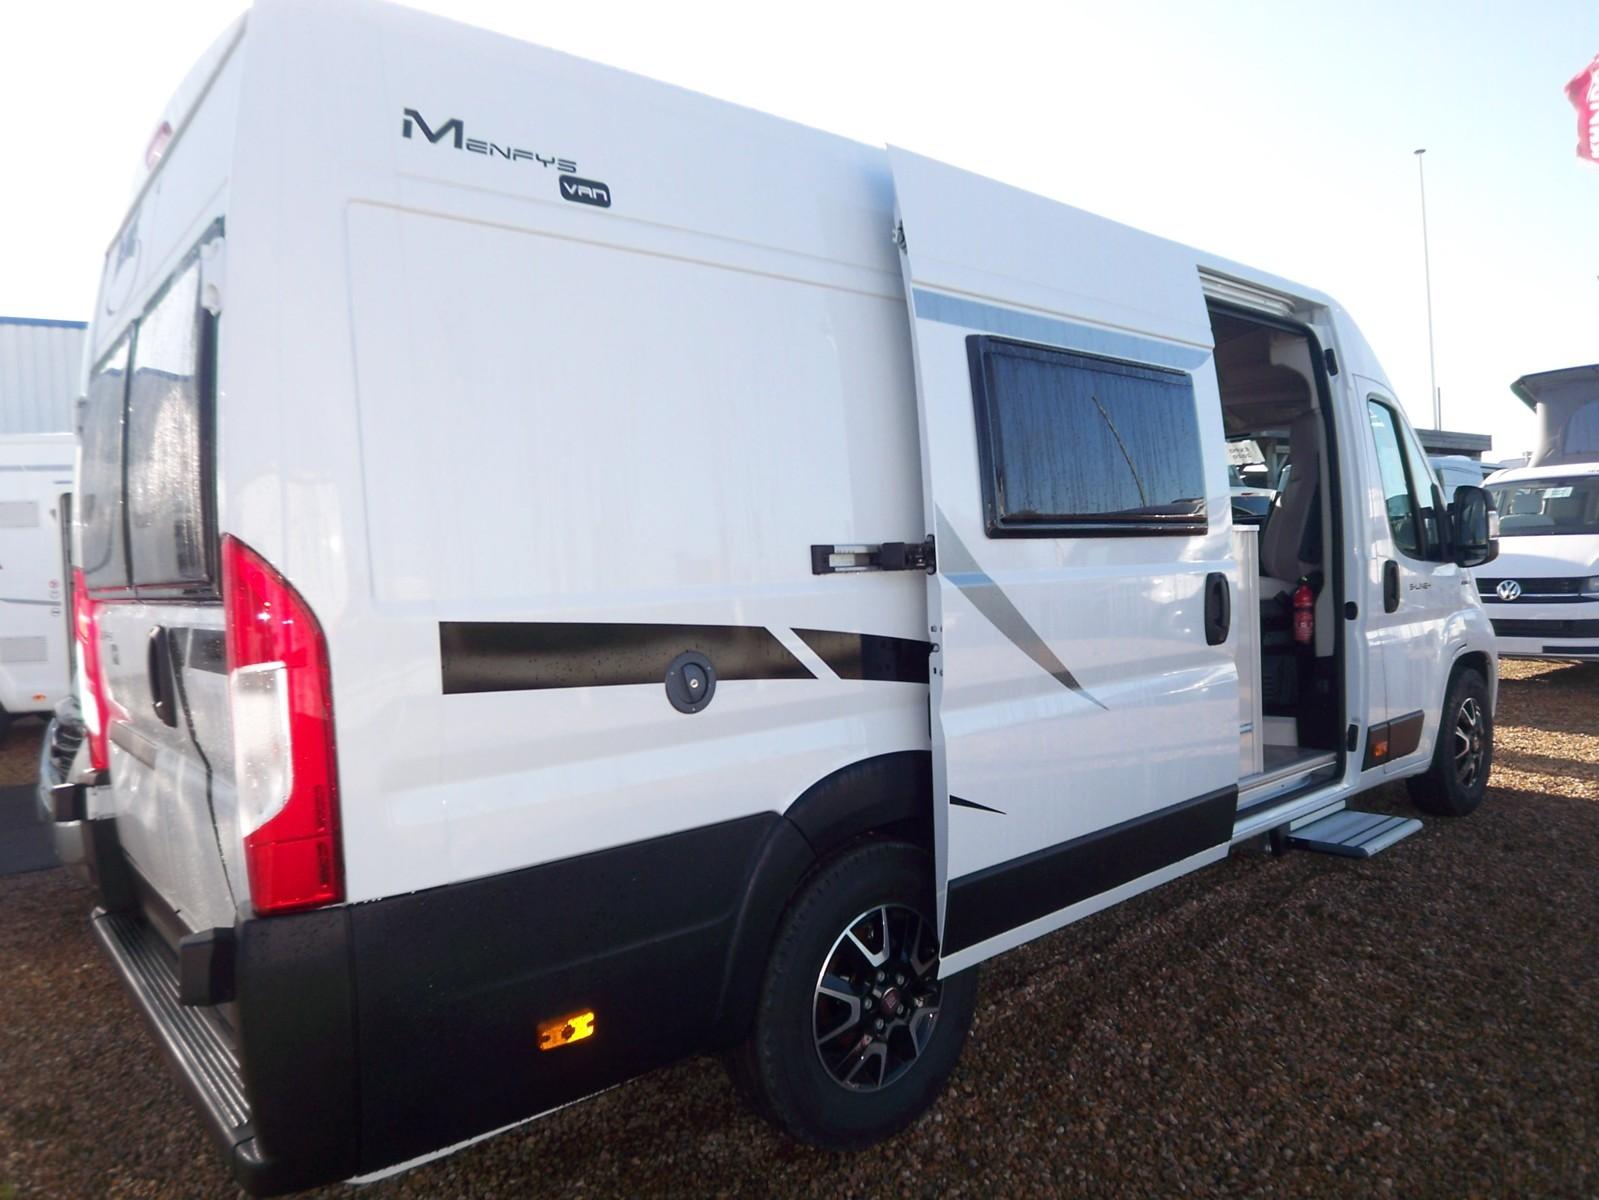 Mc Louis Menfys Van 4 Luxe Edition - 2